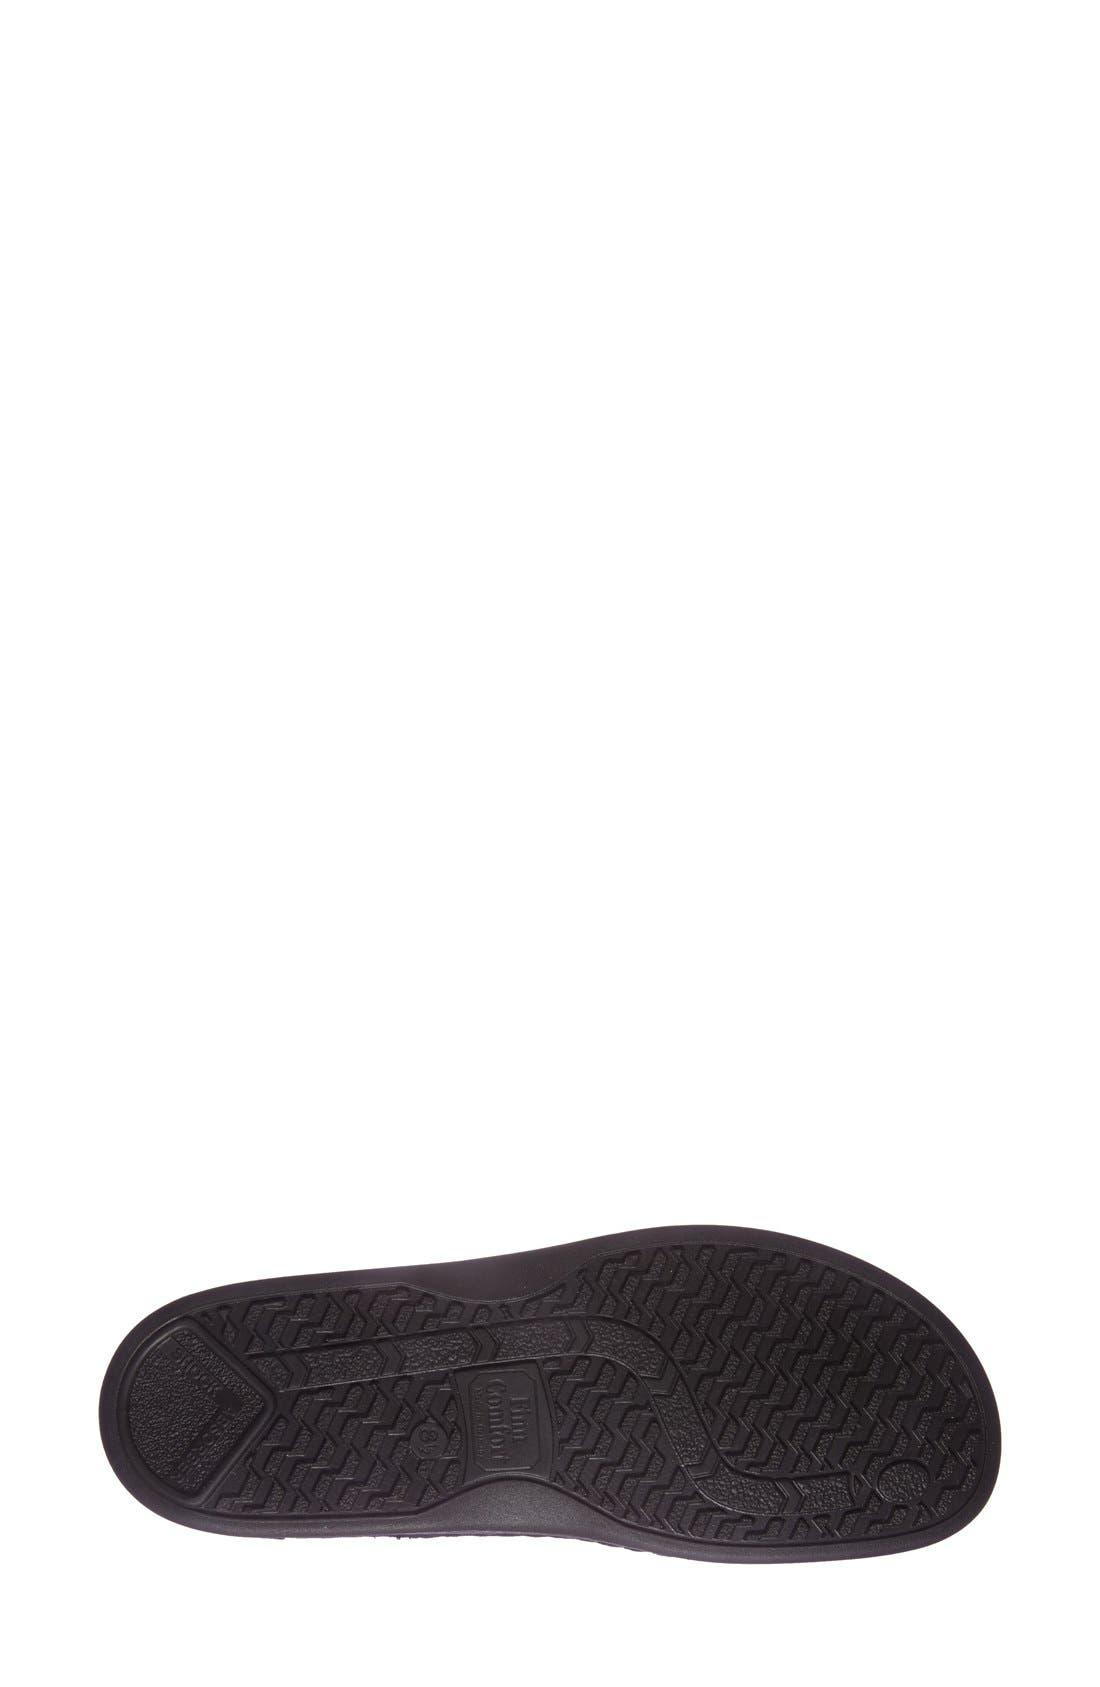 'Metz' Oxford,                             Alternate thumbnail 4, color,                             Black Leather